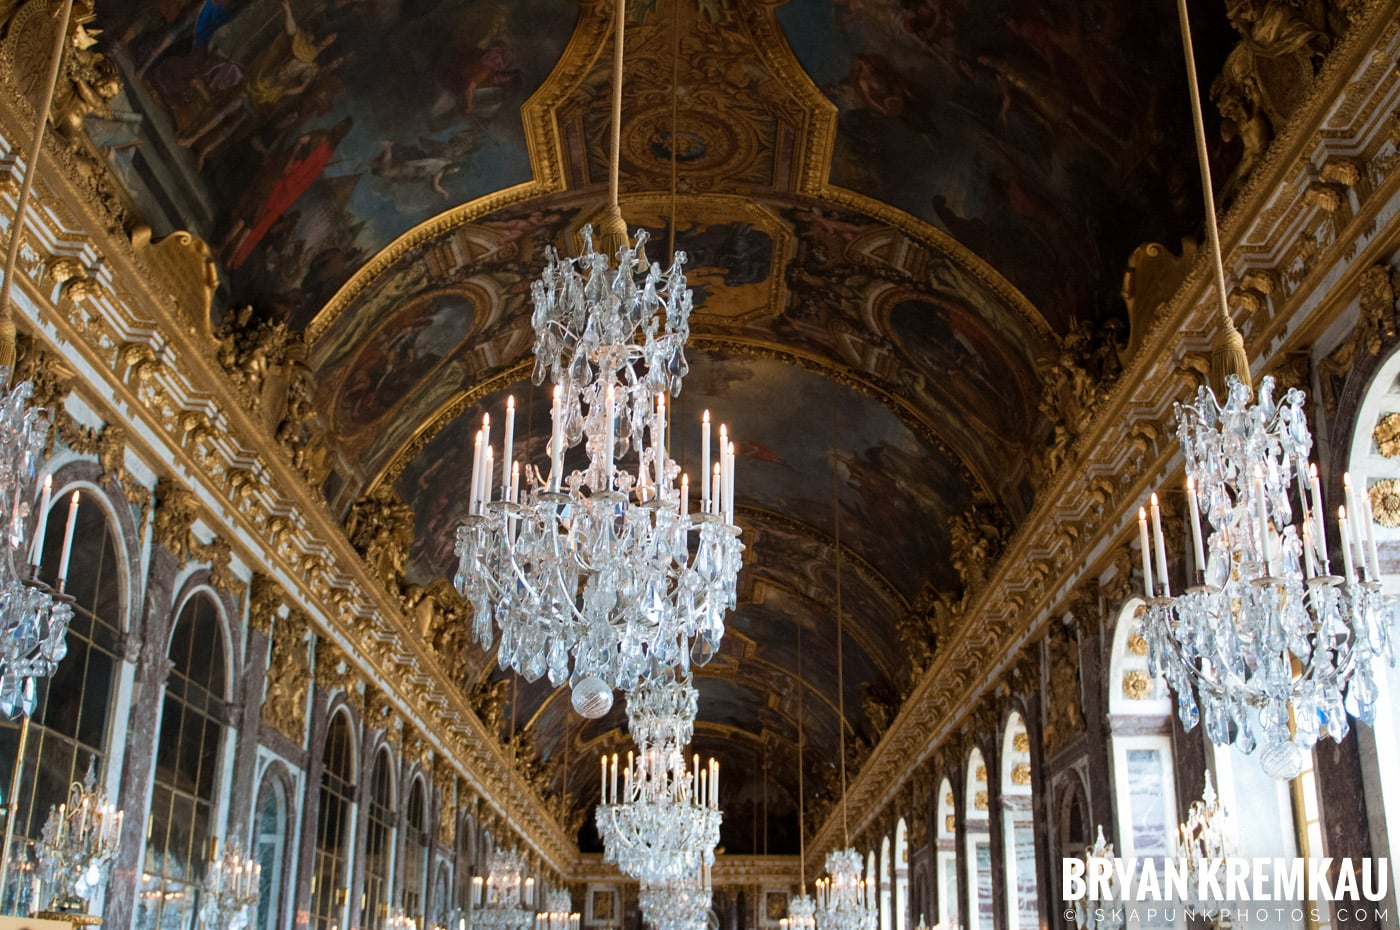 Paris, France Honeymoon - Day 2 - 7.19.11 (30)